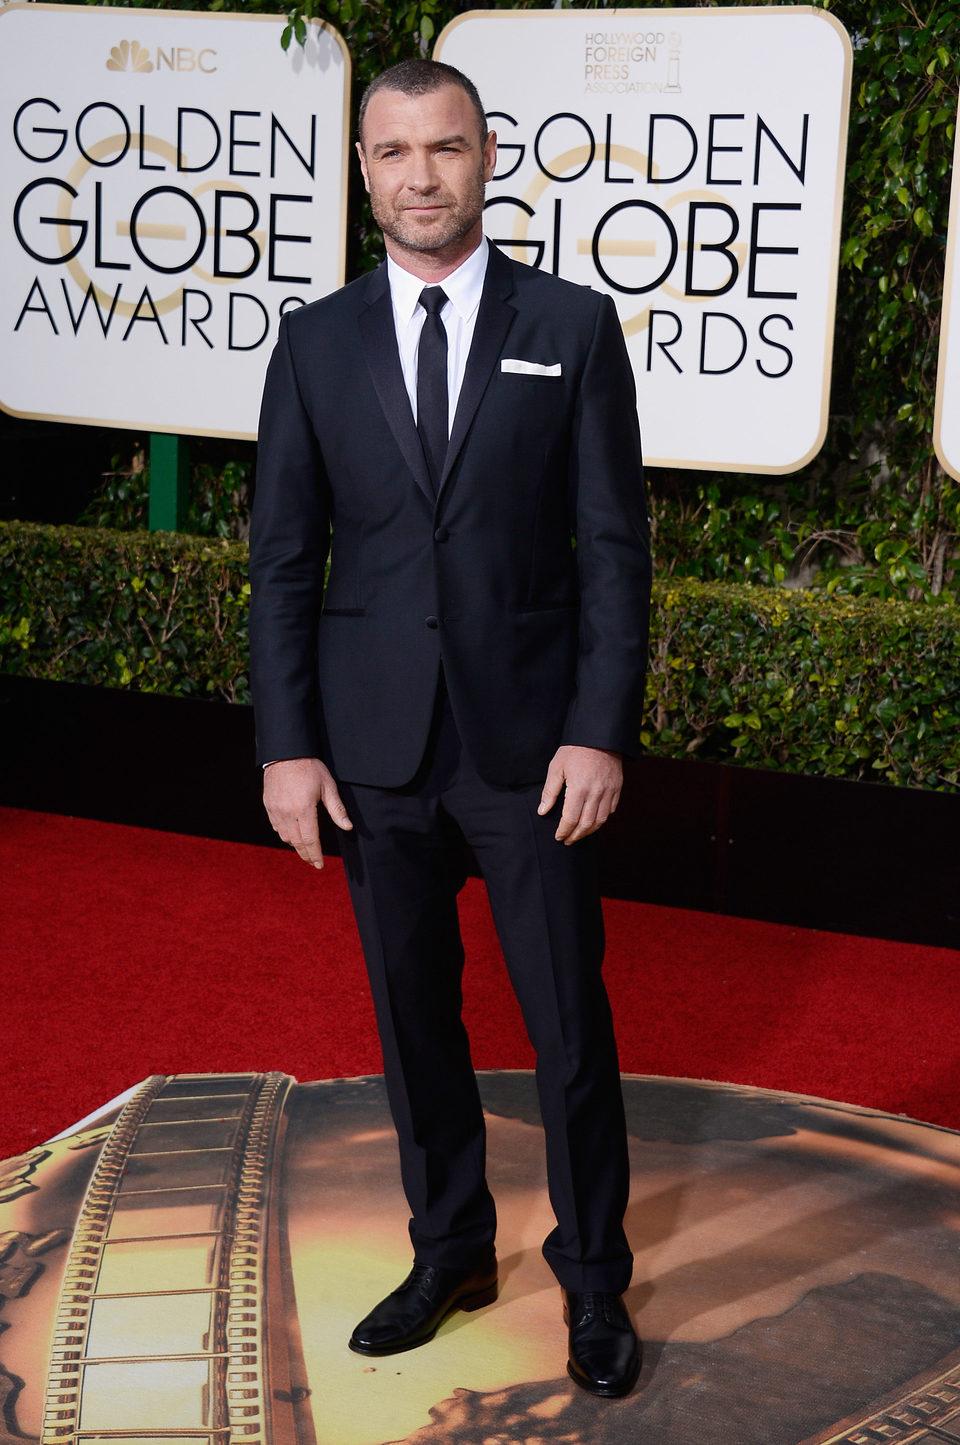 Liev Schreiber at the 2016 Golden Globes red carpet